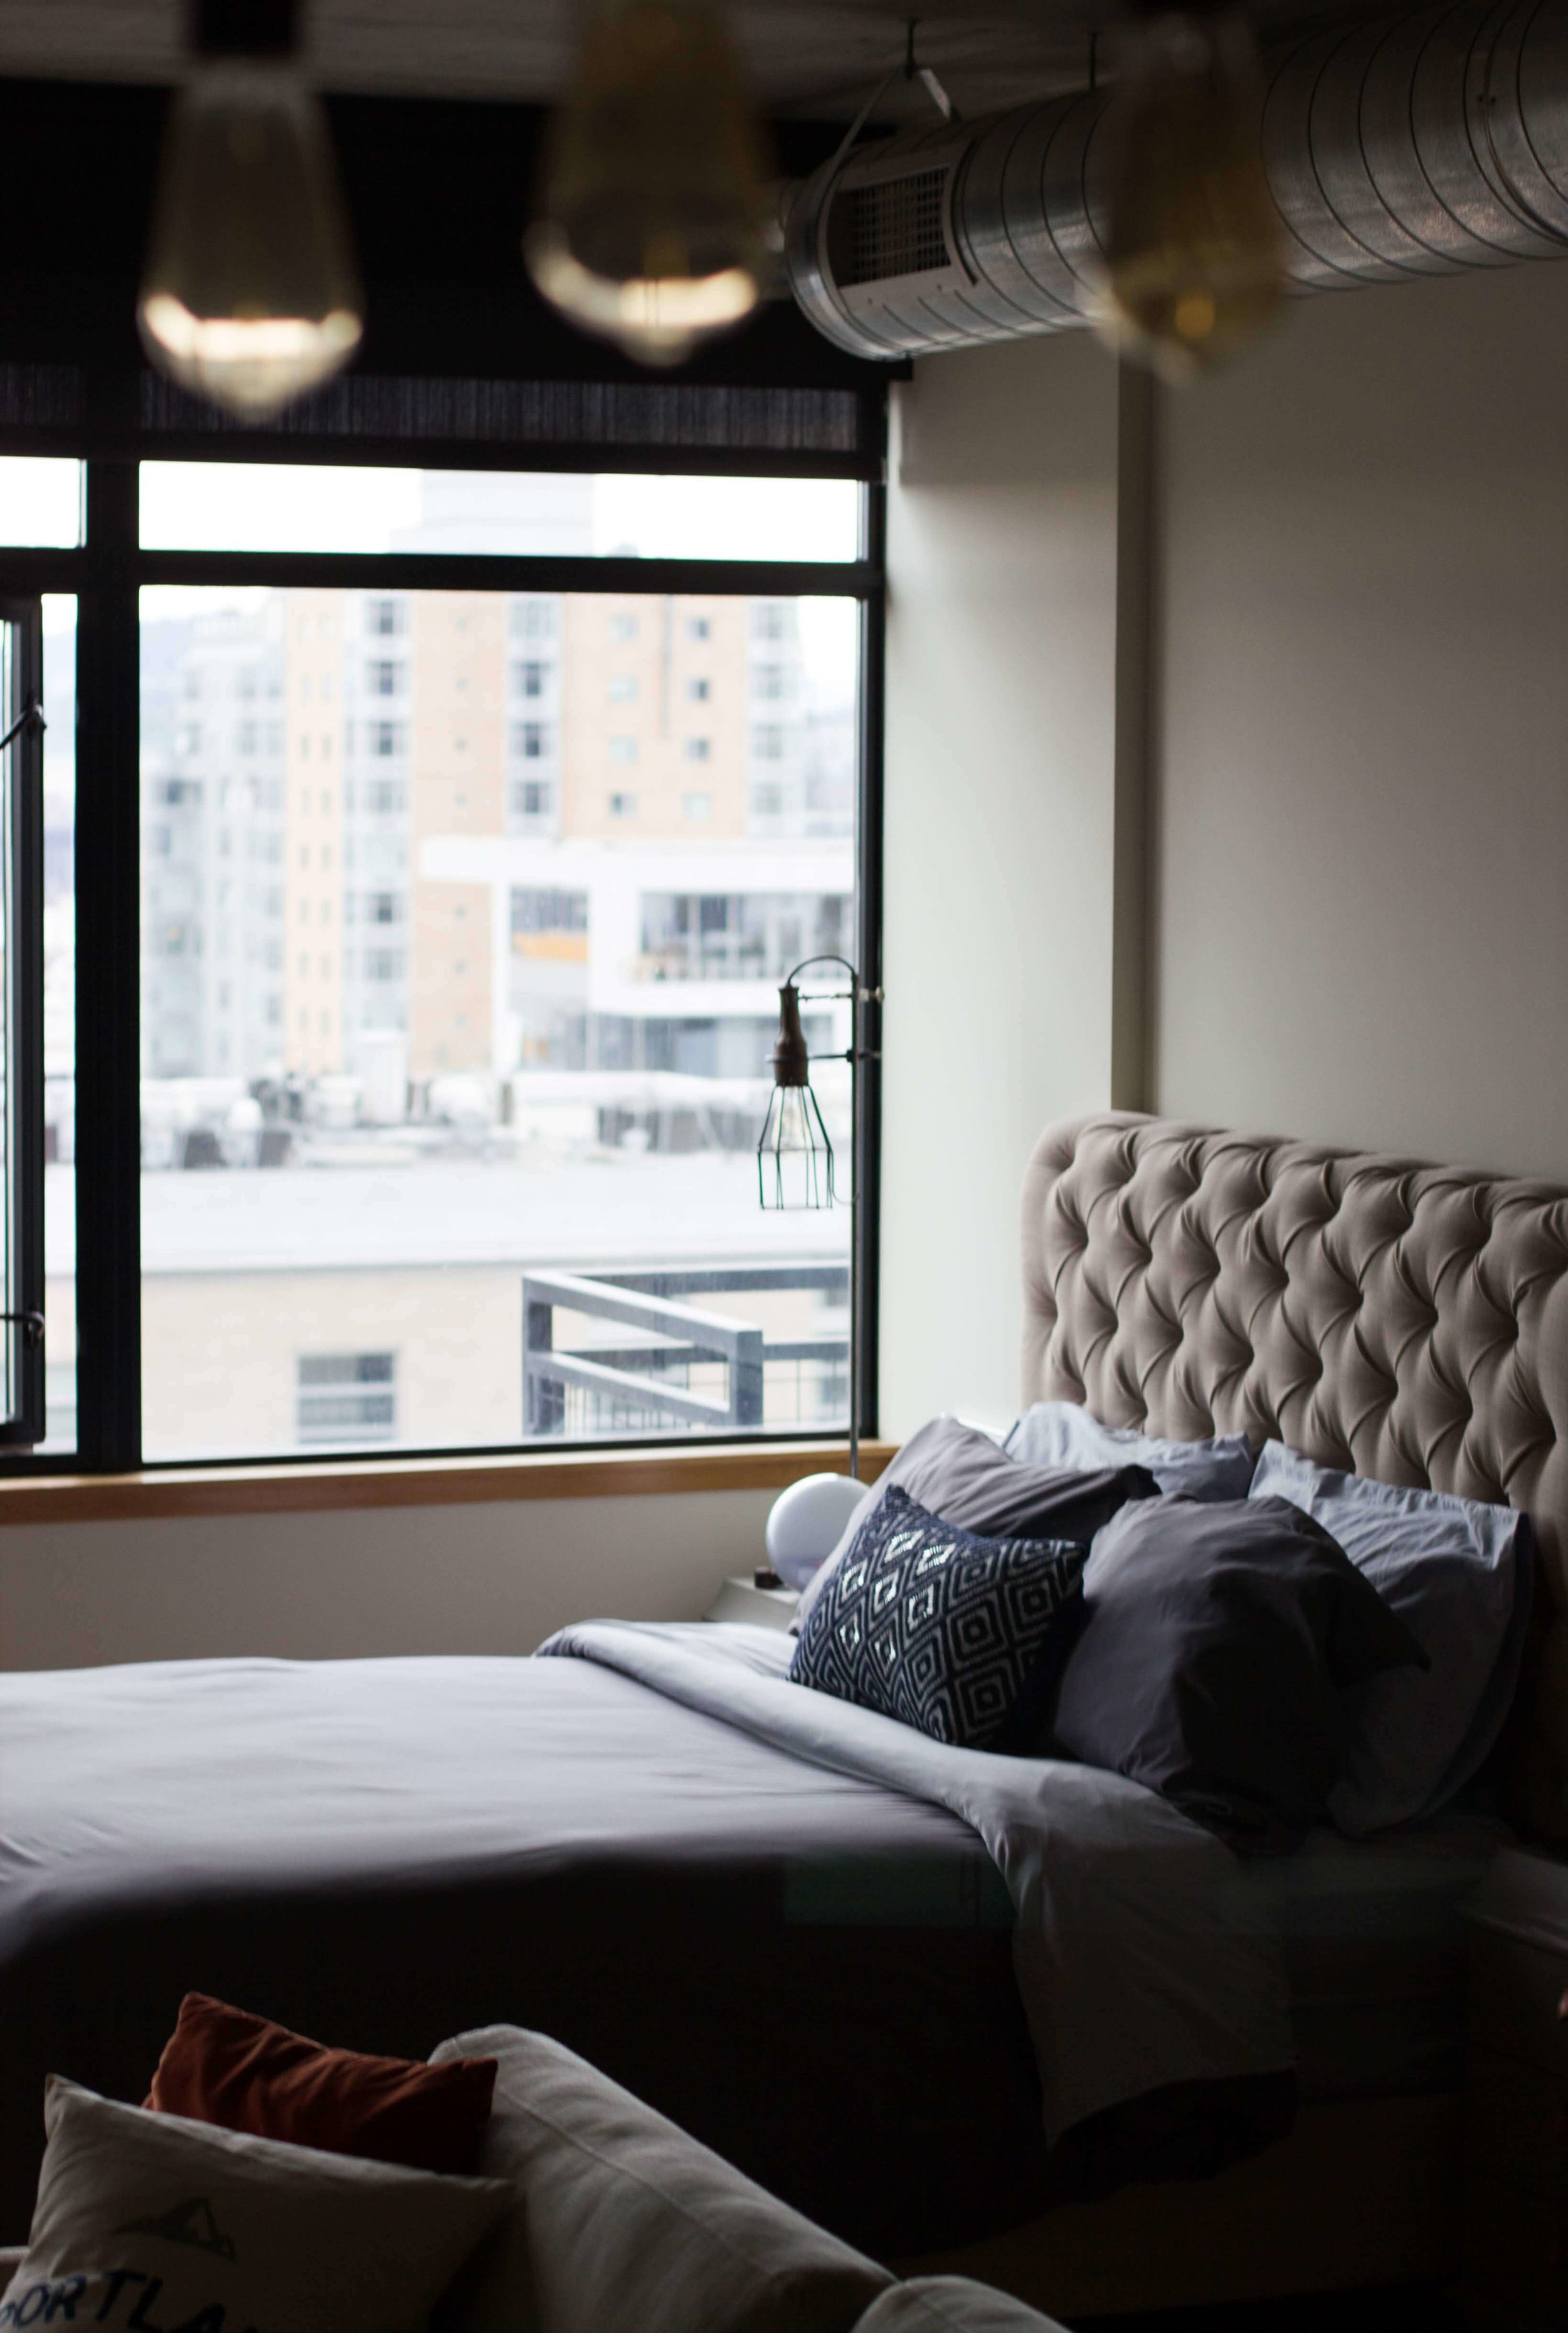 Bachelor pad blue bedroom